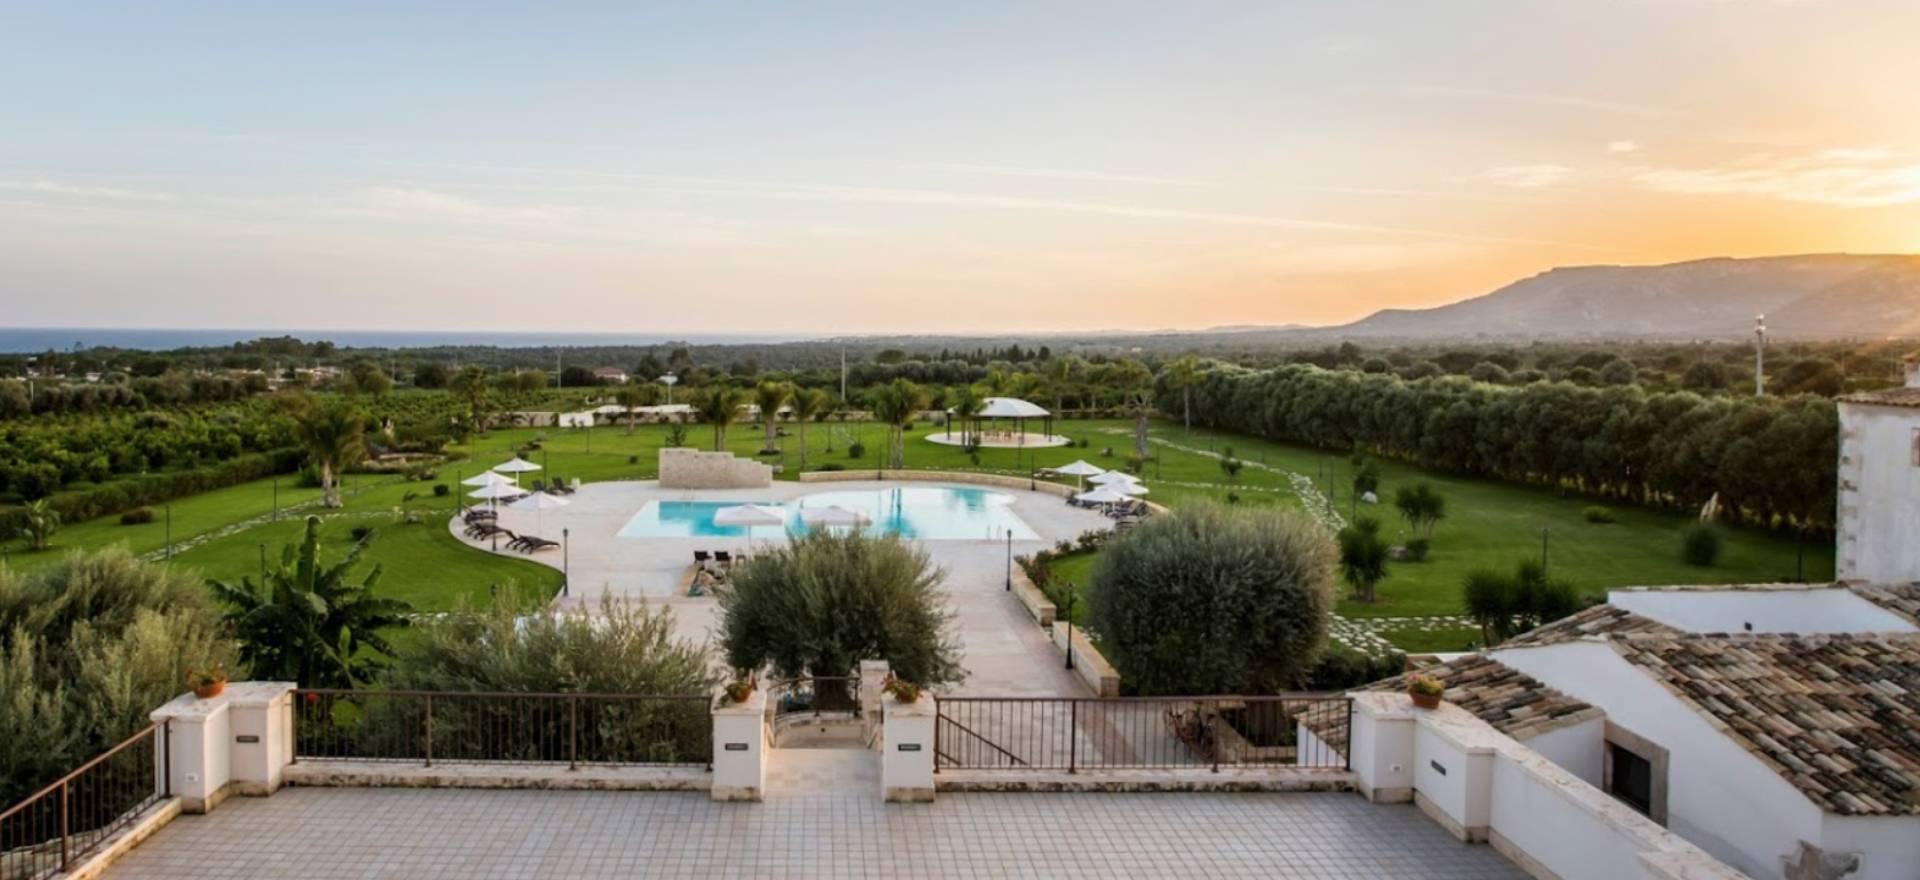 Agriturismo Sicilie Agriturismo met groot zwembad nabij strand